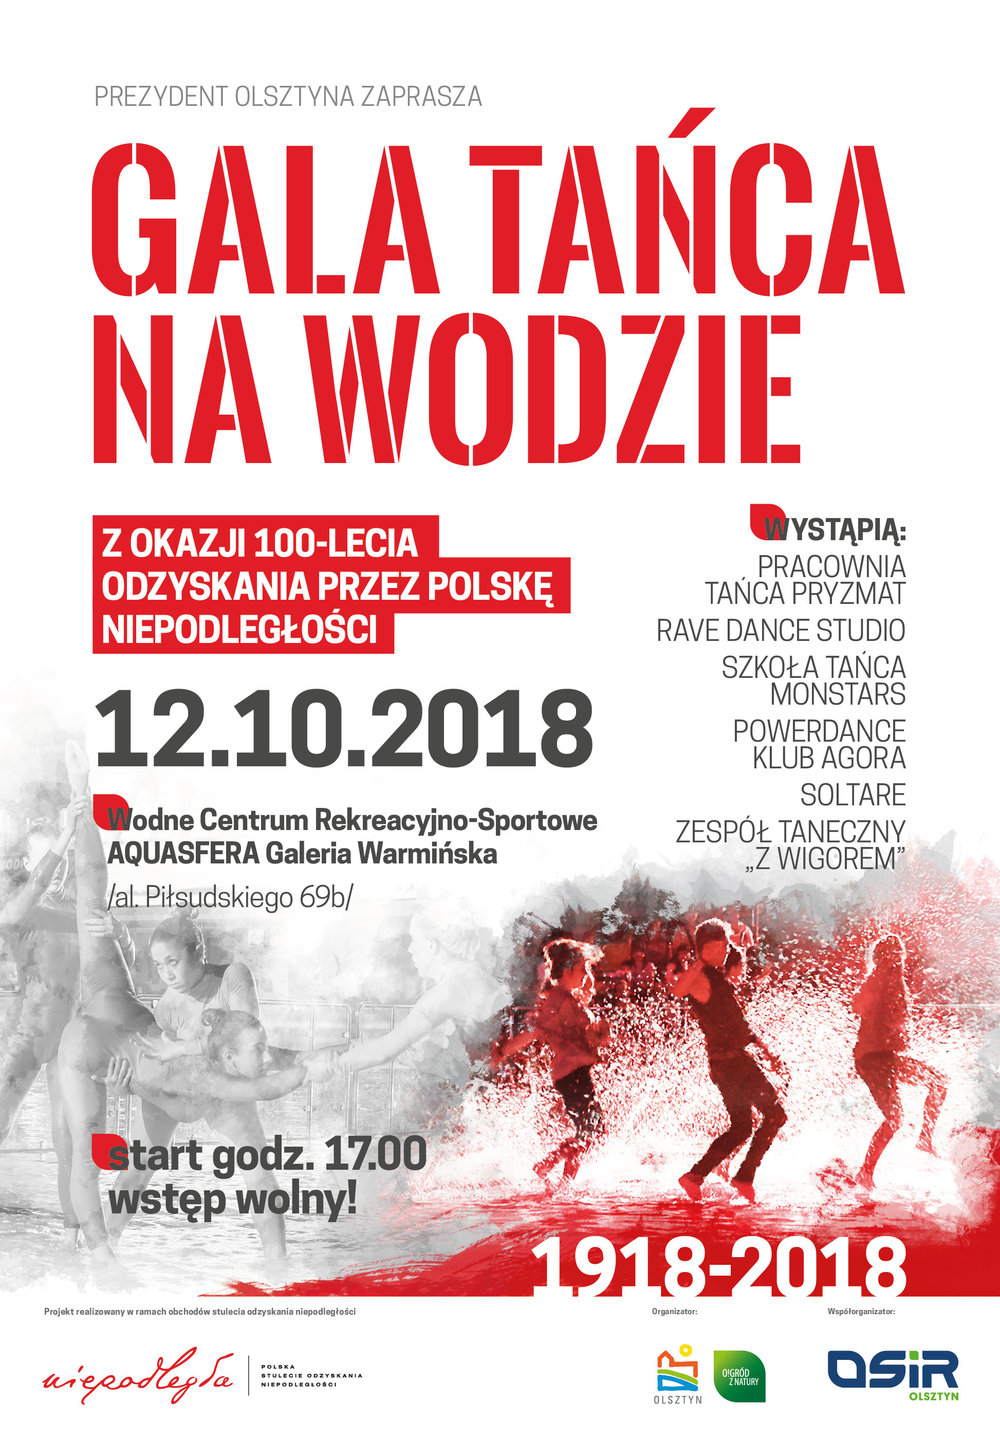 gala tanca na wodzie 2018.jpg